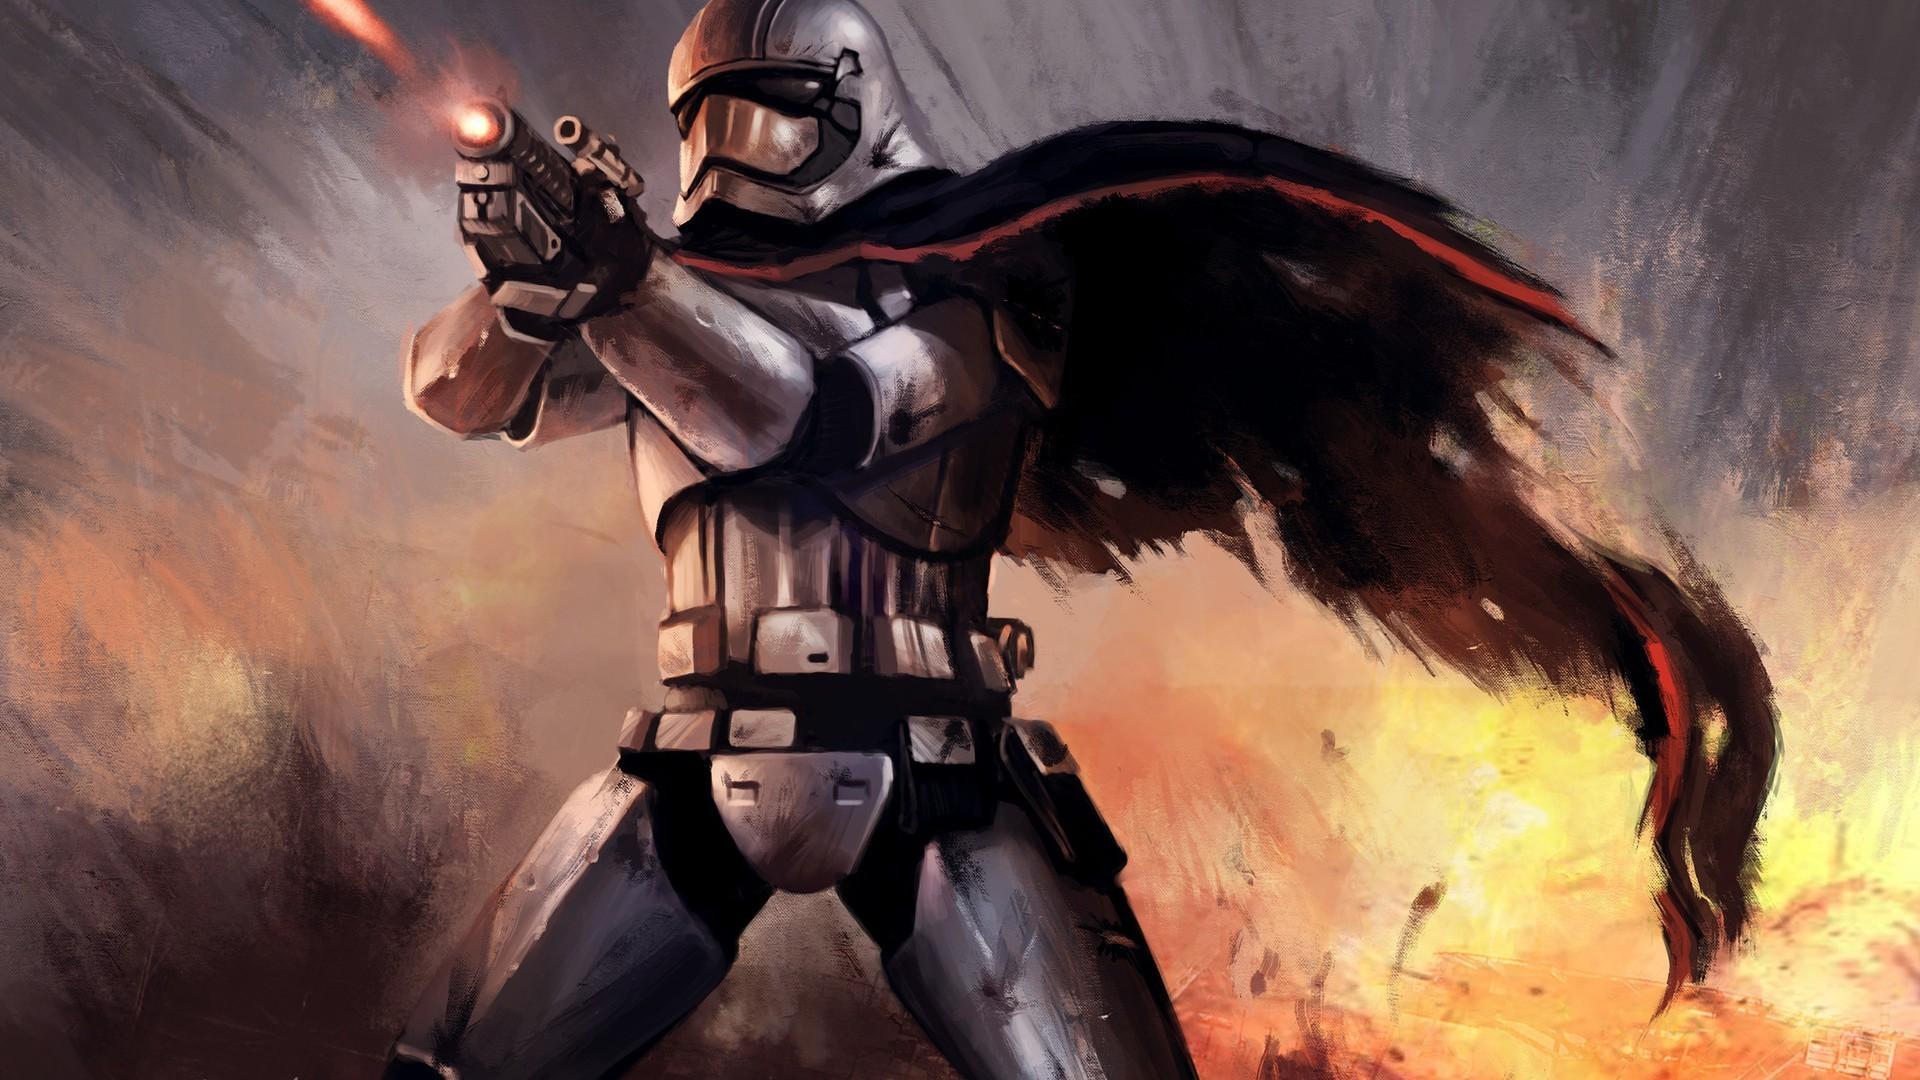 Wallpaper Illustration Star Wars Star Wars The Force Awakens